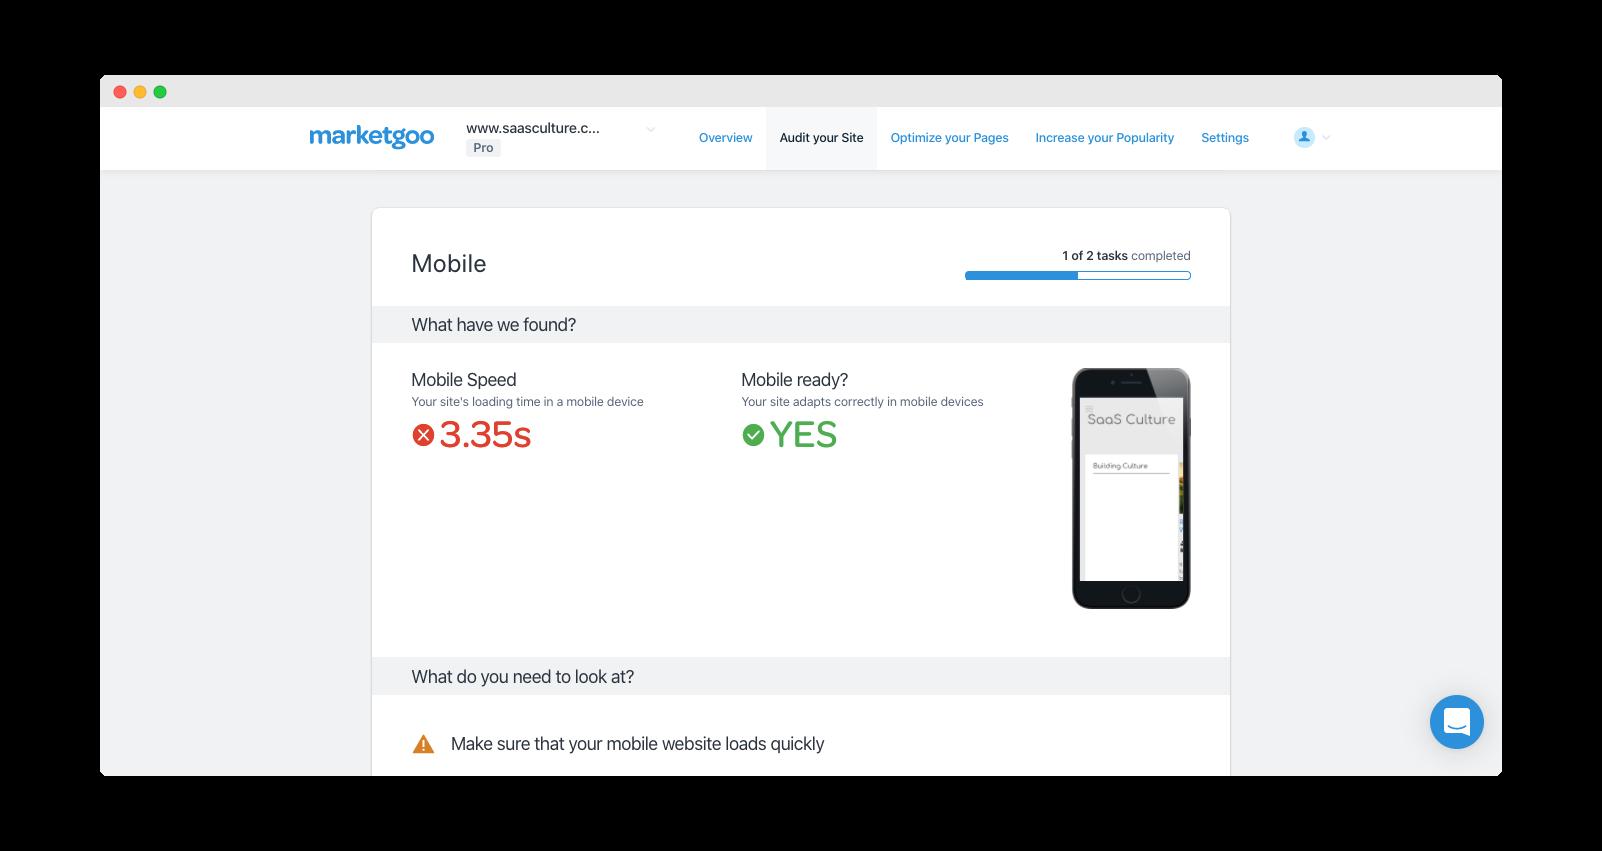 marketgoo-pro-mobile